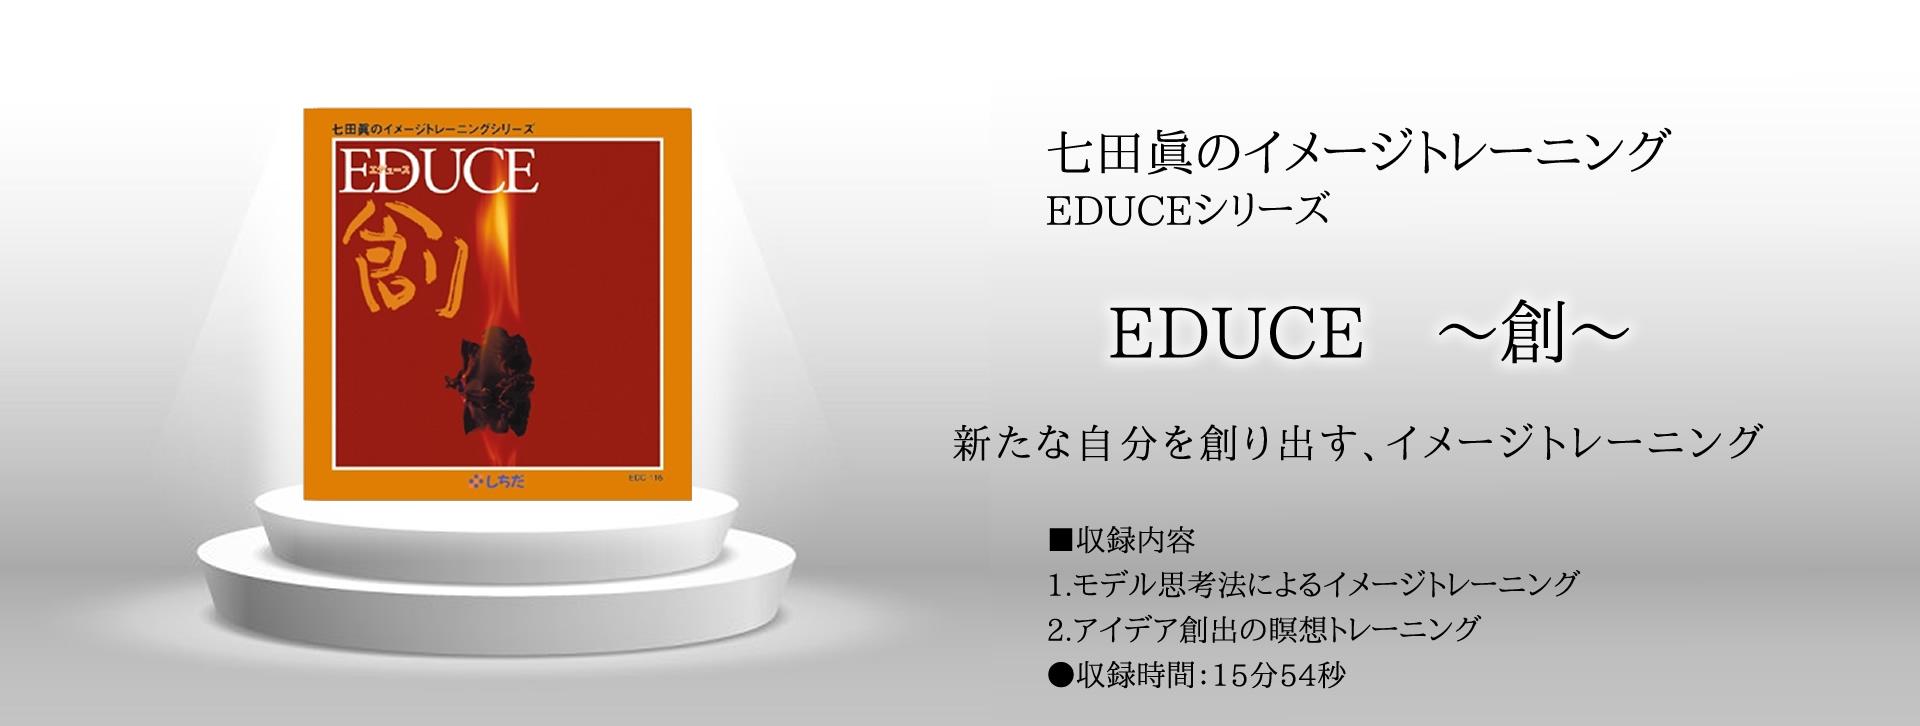 EDUCE 創